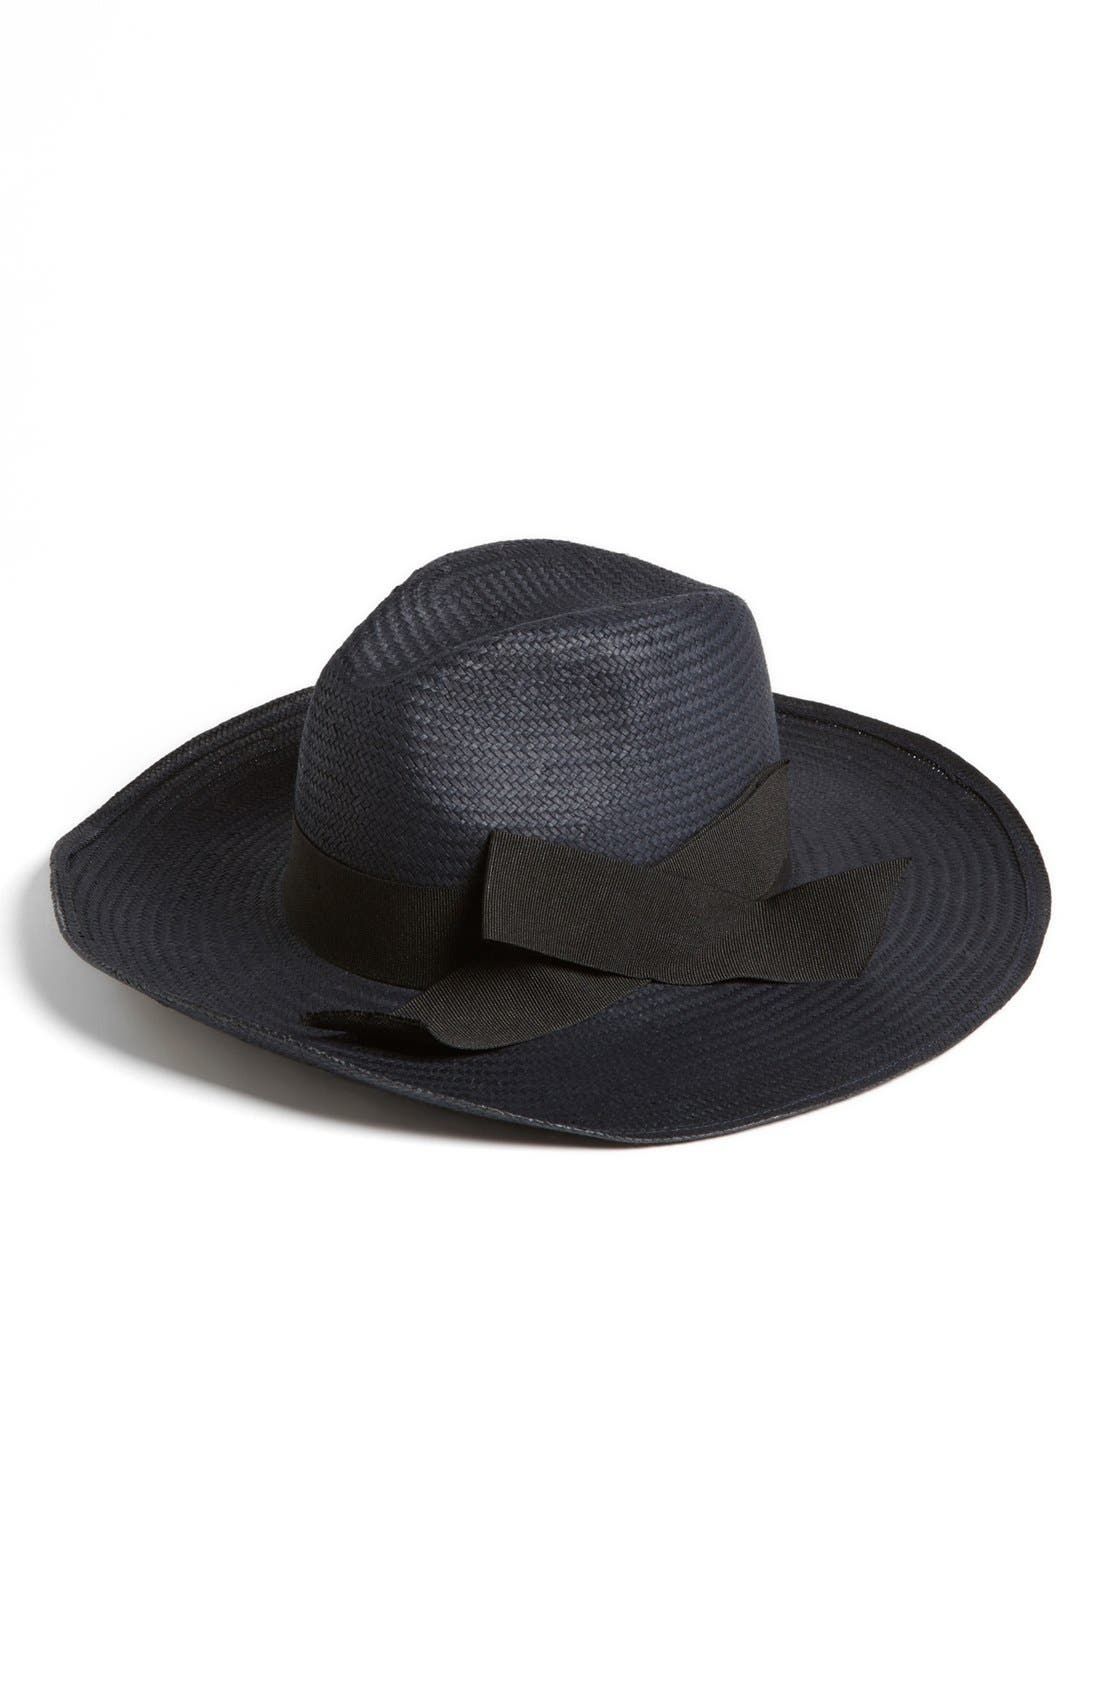 Main Image - Nordstrom 'Drama' Hat